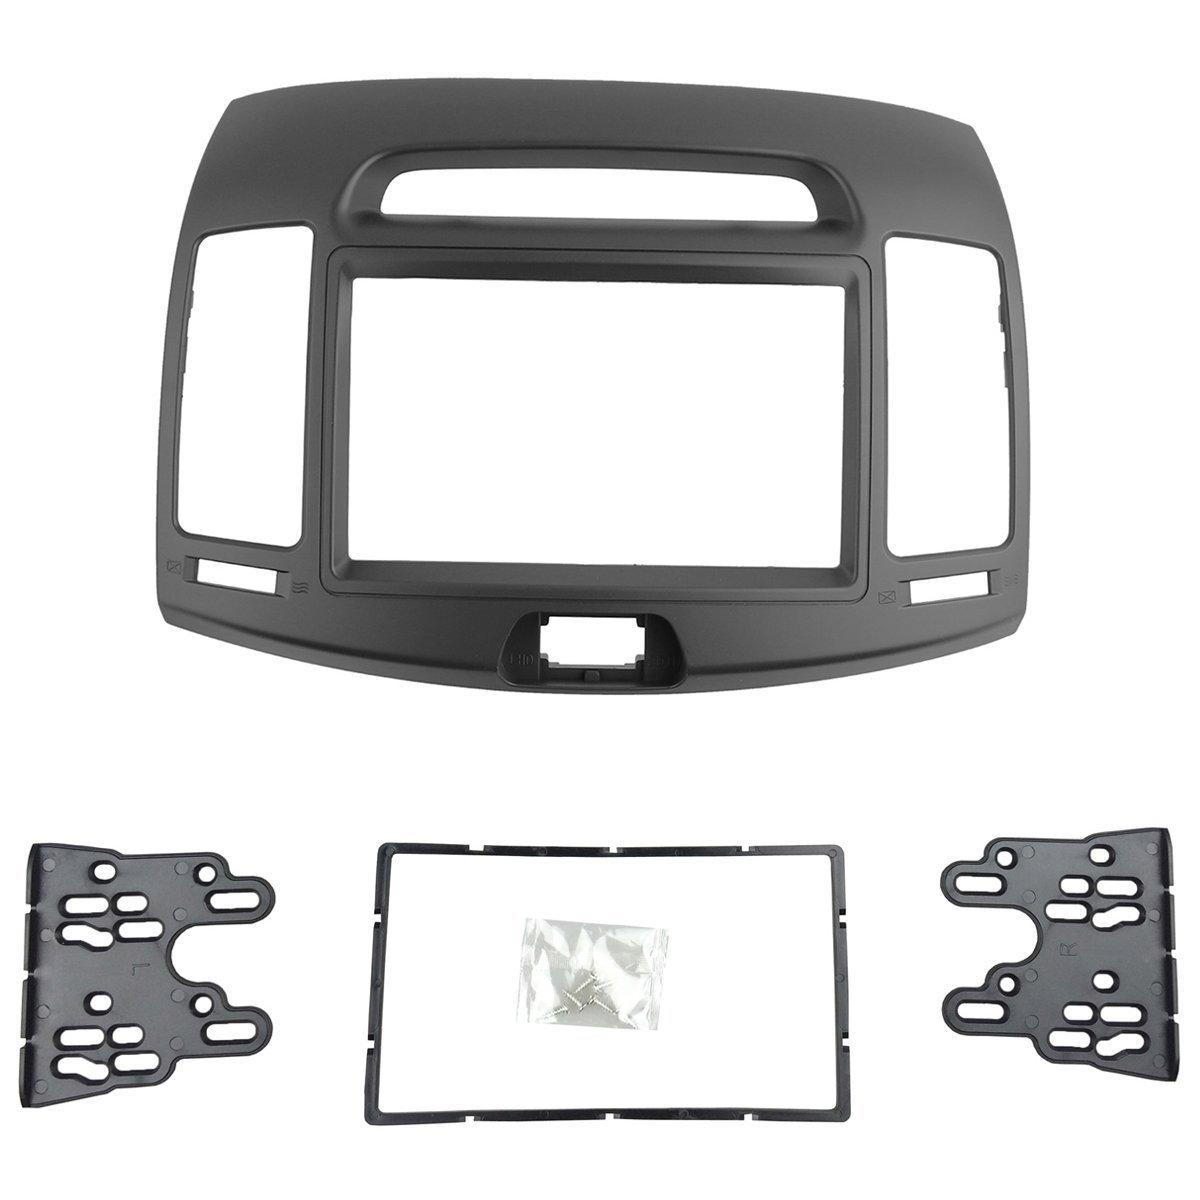 DKMUS Car Stereo Dash Radio Fascia Kit For 2006-2010 Hyundai Elantra (HD), Avante (HD) 2006-2010 Installation Trim Panel Frame Double Din (Grey)